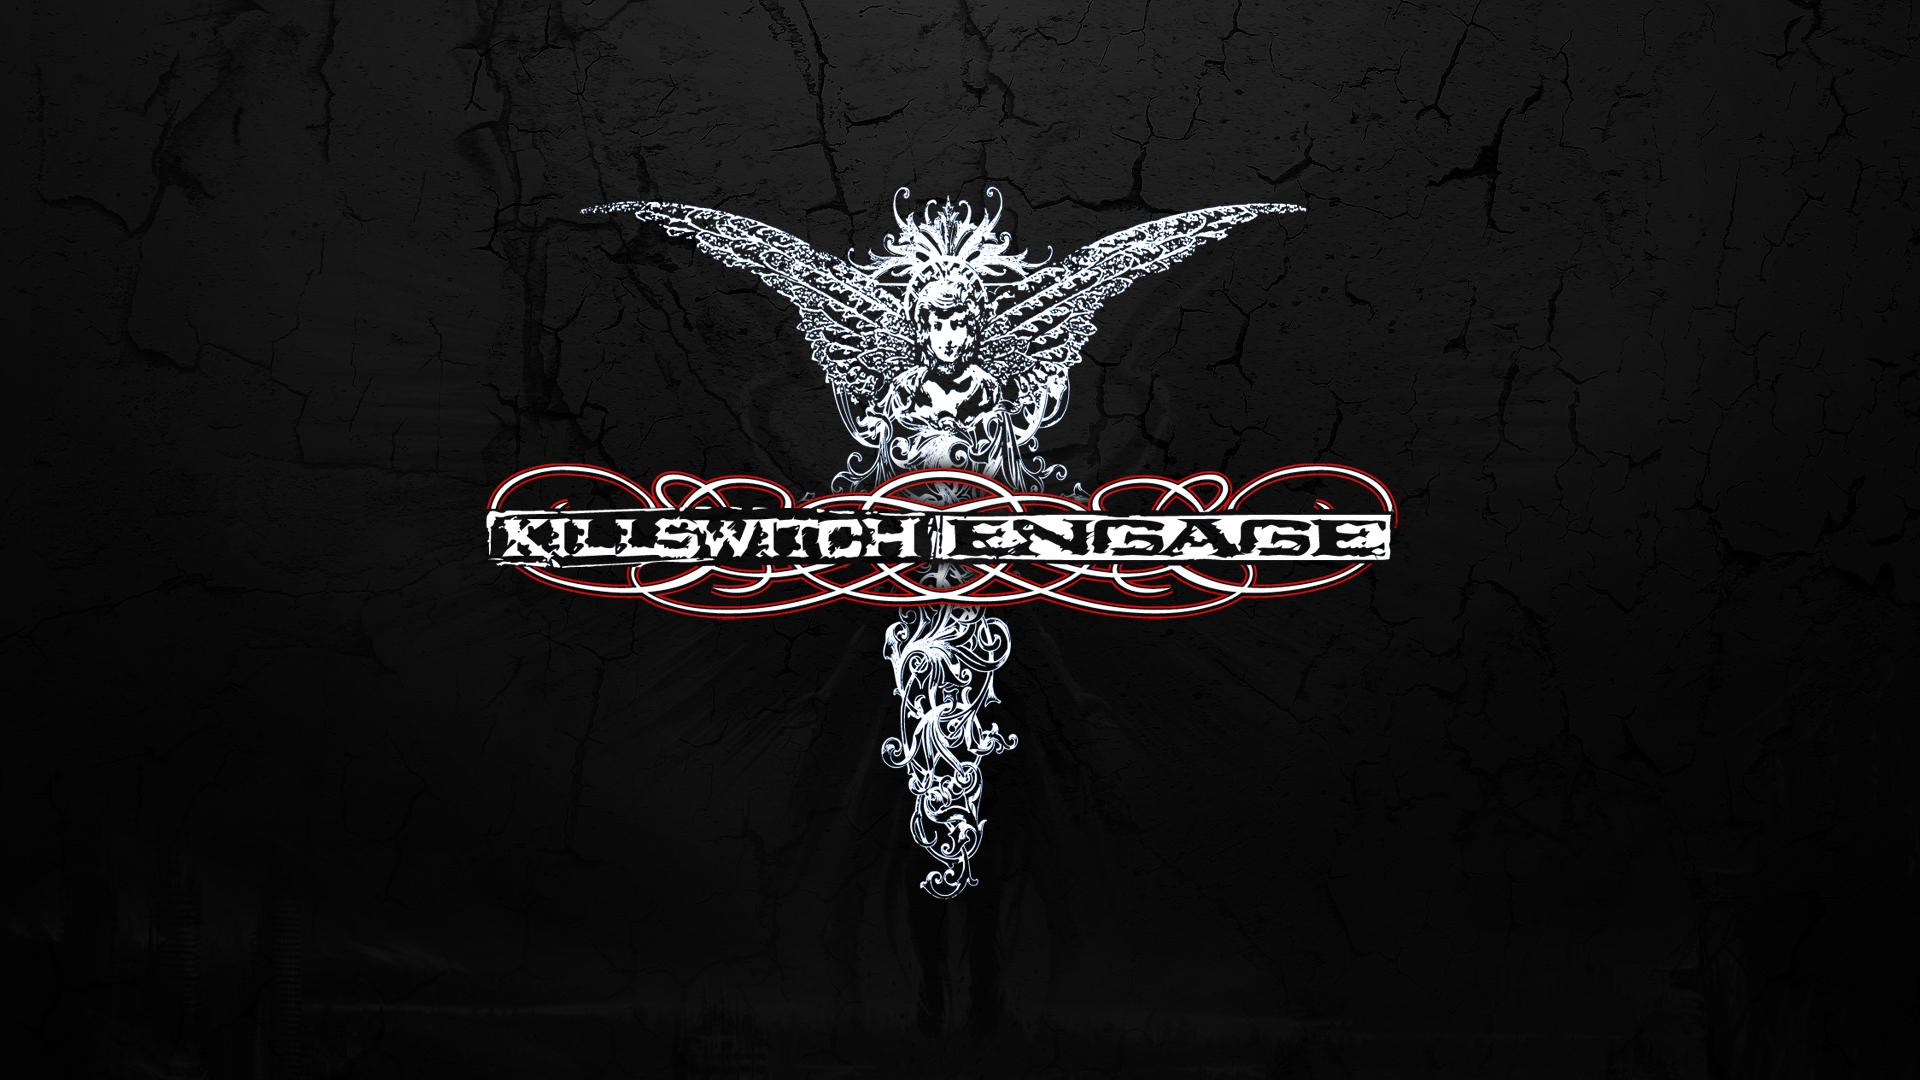 Best 38 Killswitch Engage Wallpaper on HipWallpaper Killswitch 1920x1080